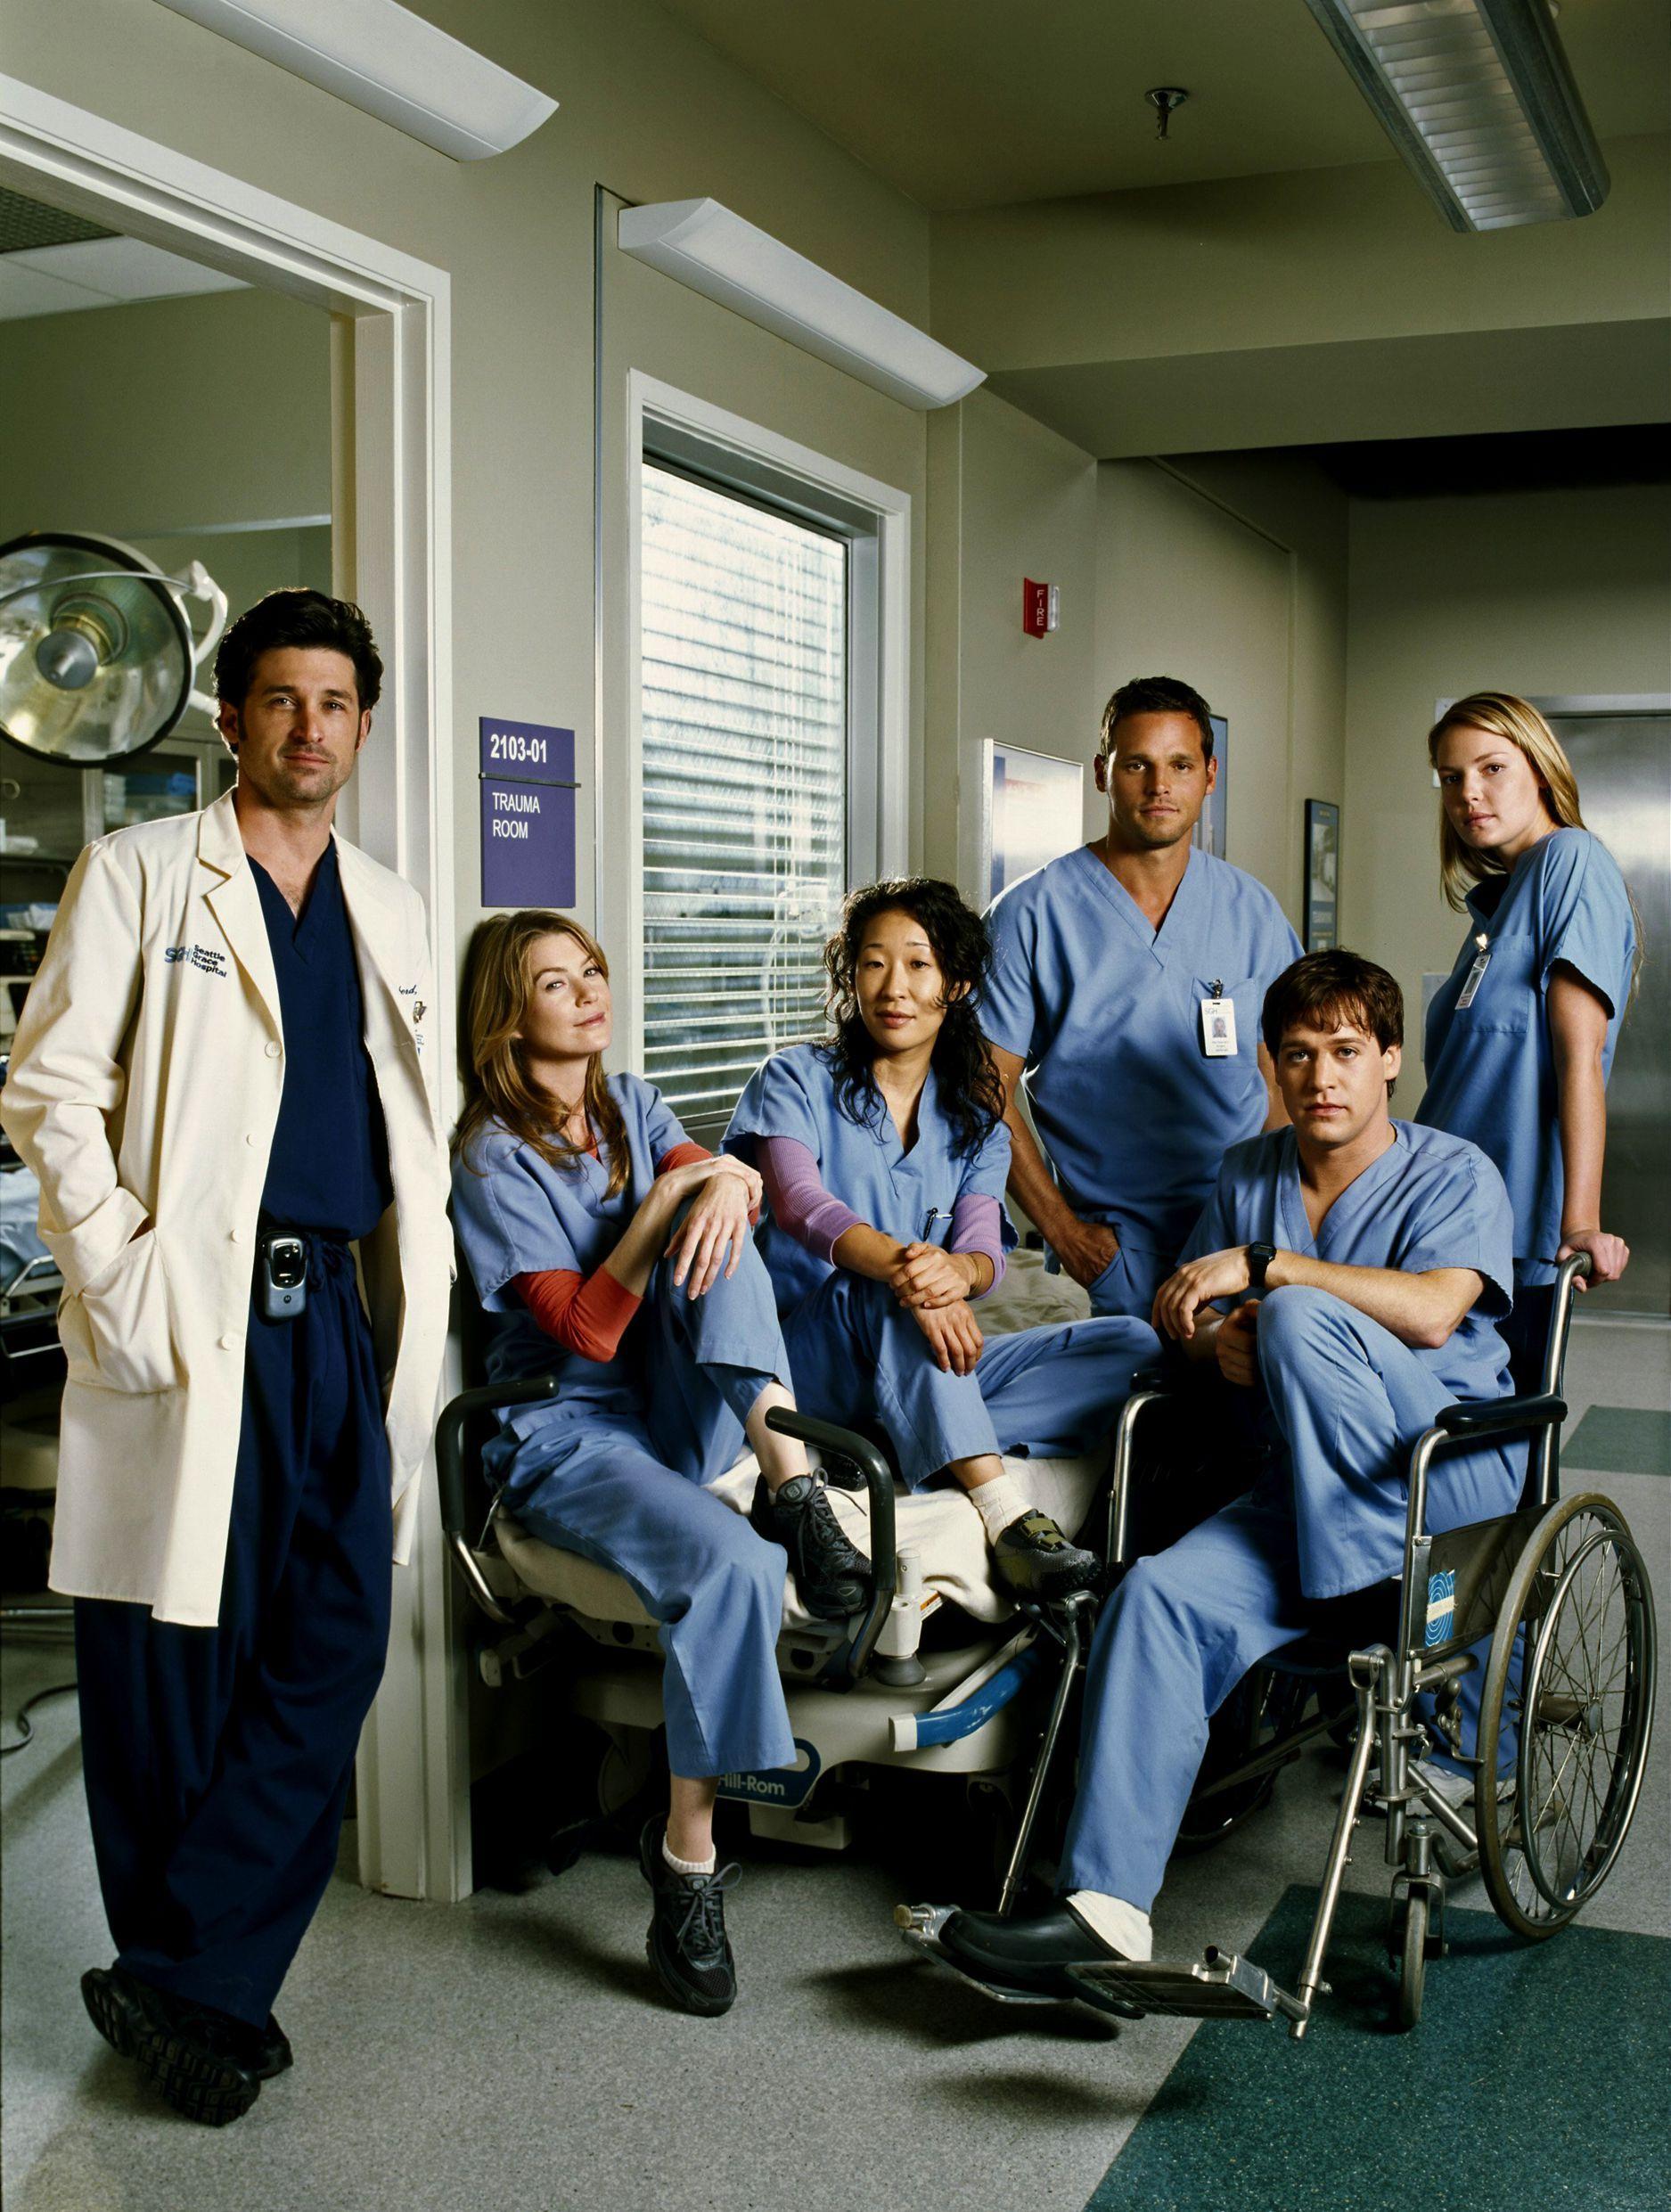 Pin By Cheryl Meyer On Grey S Anatomy Wallpaper Greys Anatomy Greys Anatomy George Greys Anatomy Memes